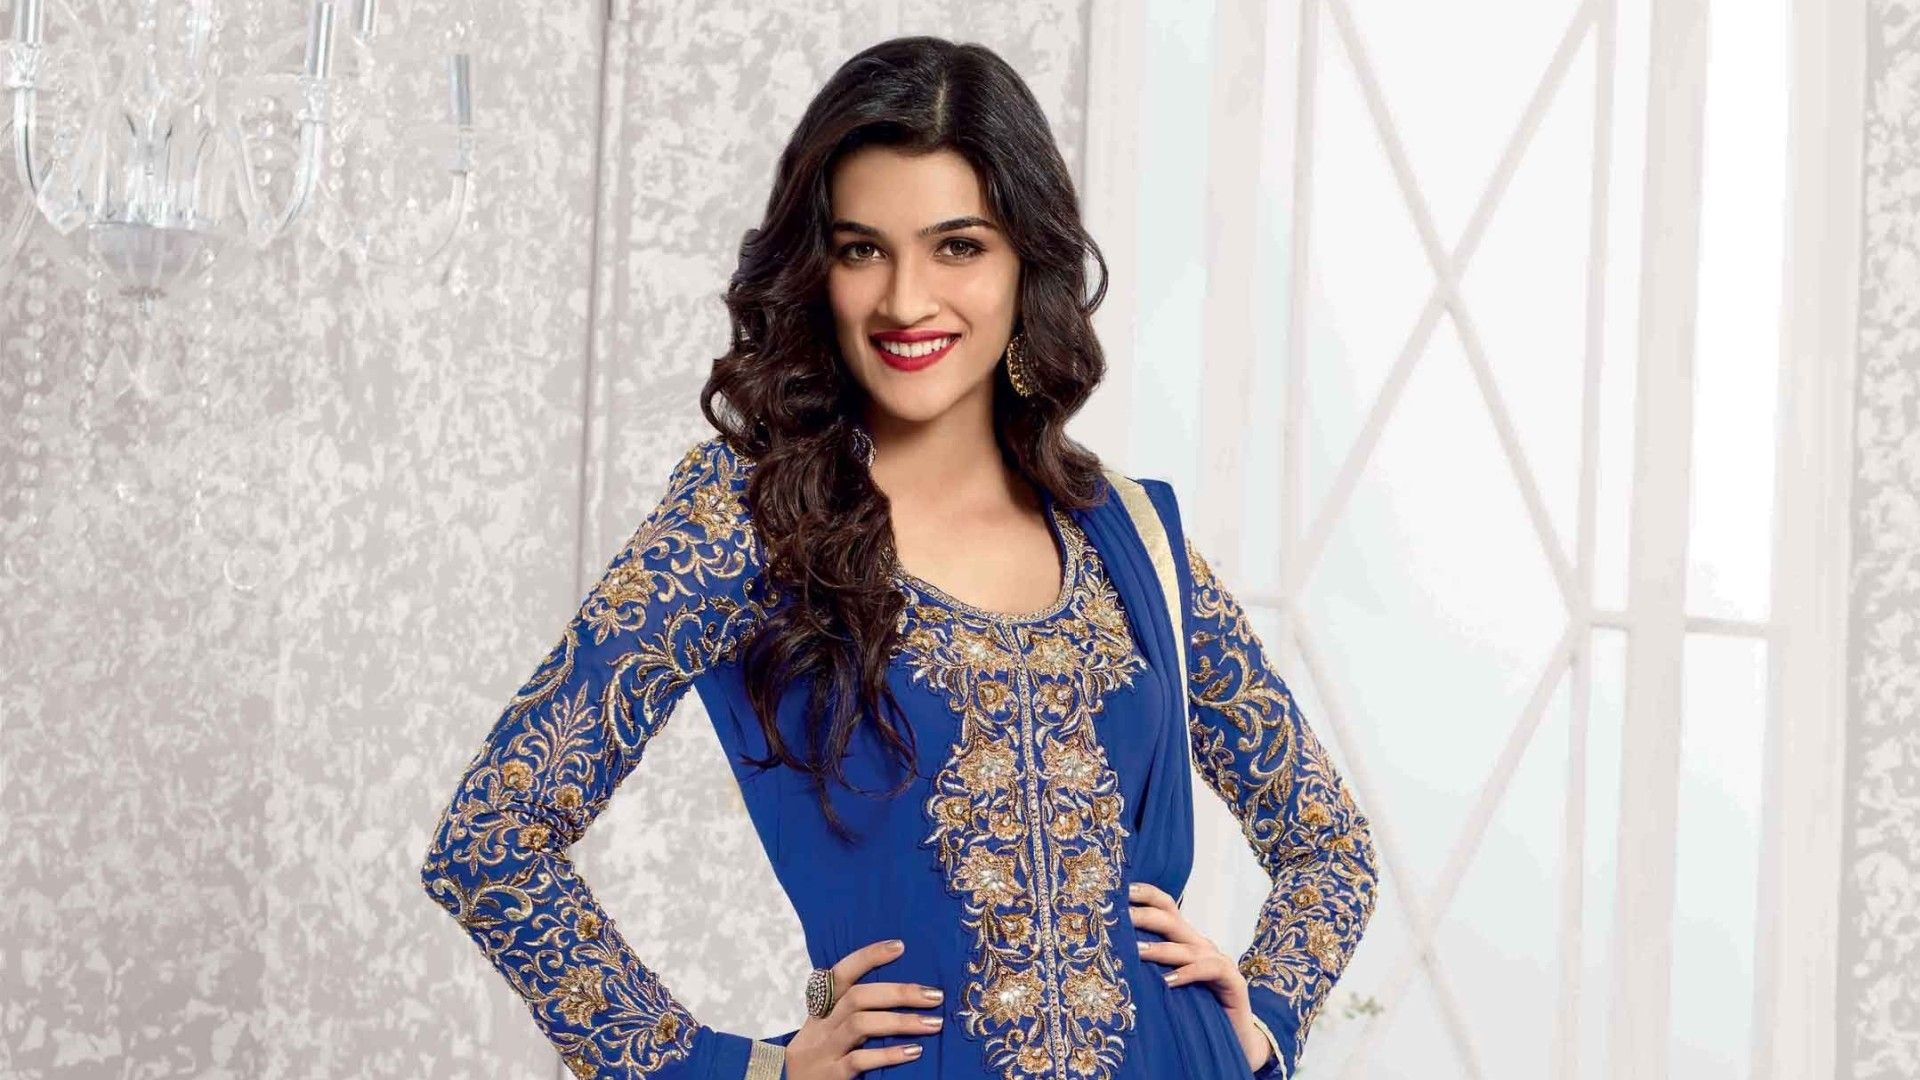 Full Hd Wallpapers Bollywood Actress Wallpaper Actress